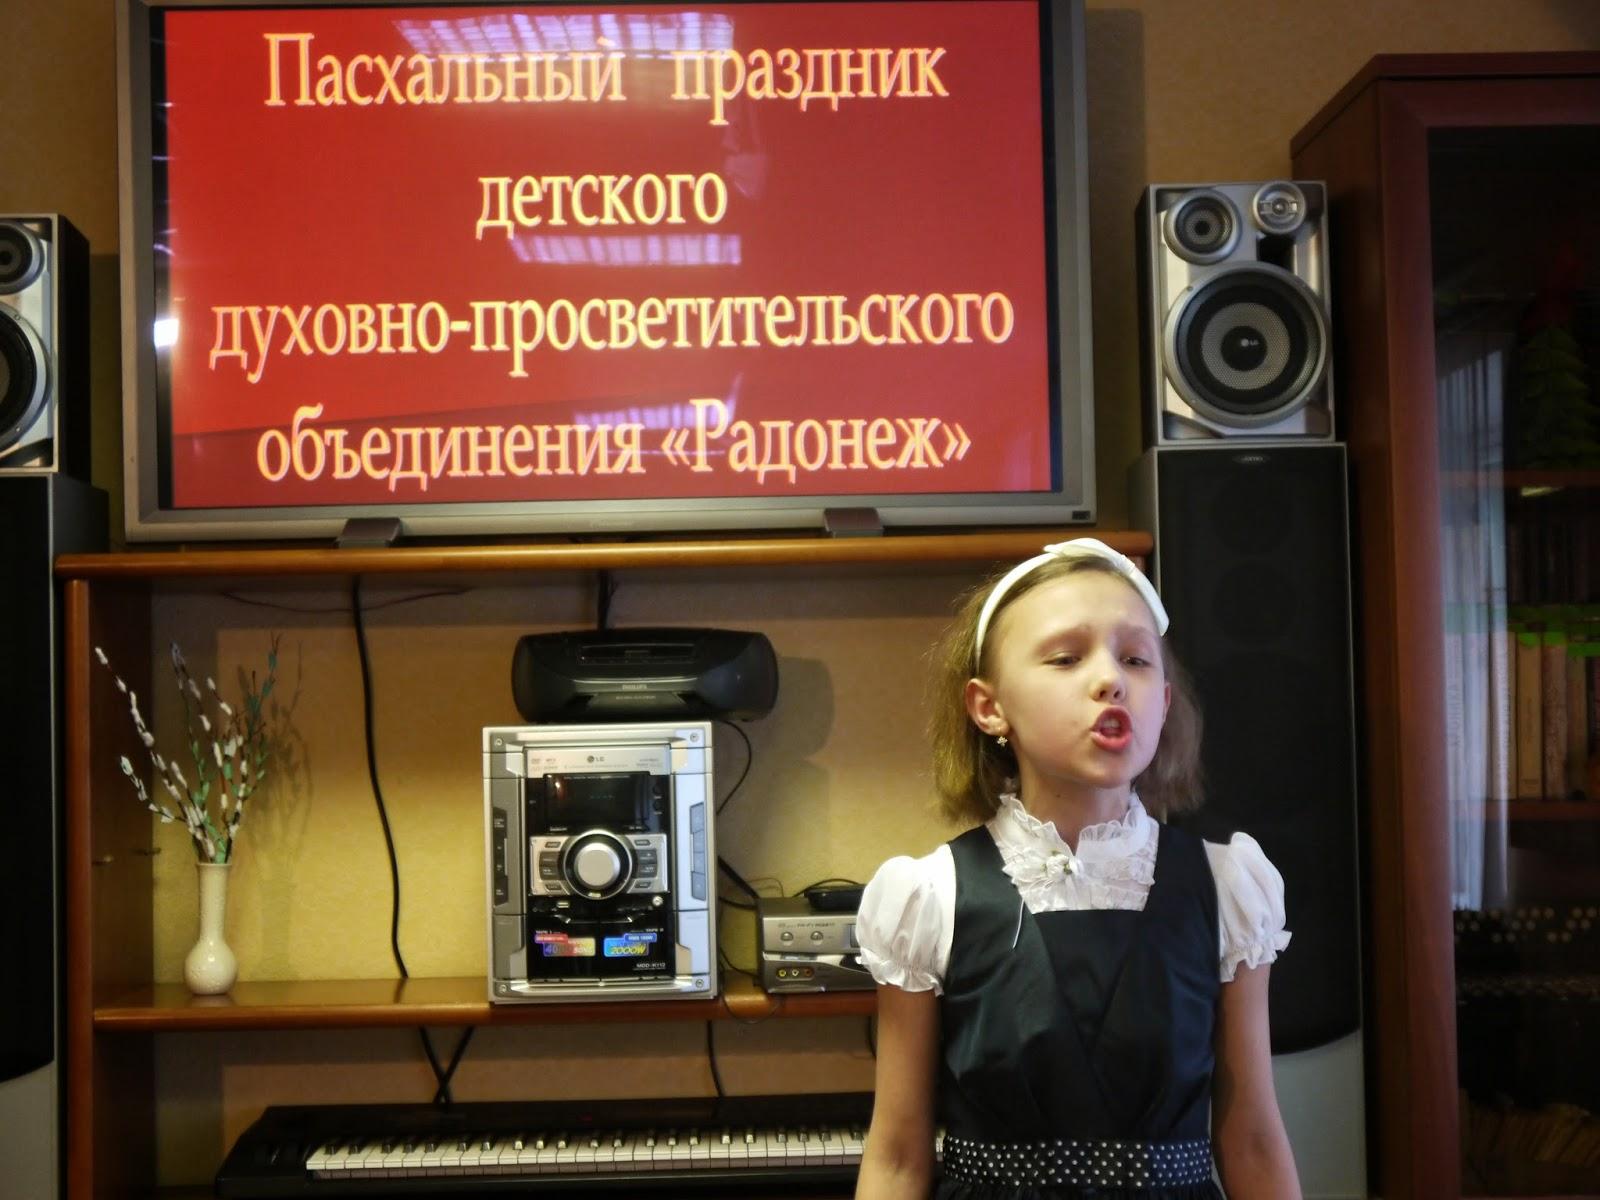 https://fotki.yandex.ru/next/users/serp-ff/album/476378/view/1163857?page=0